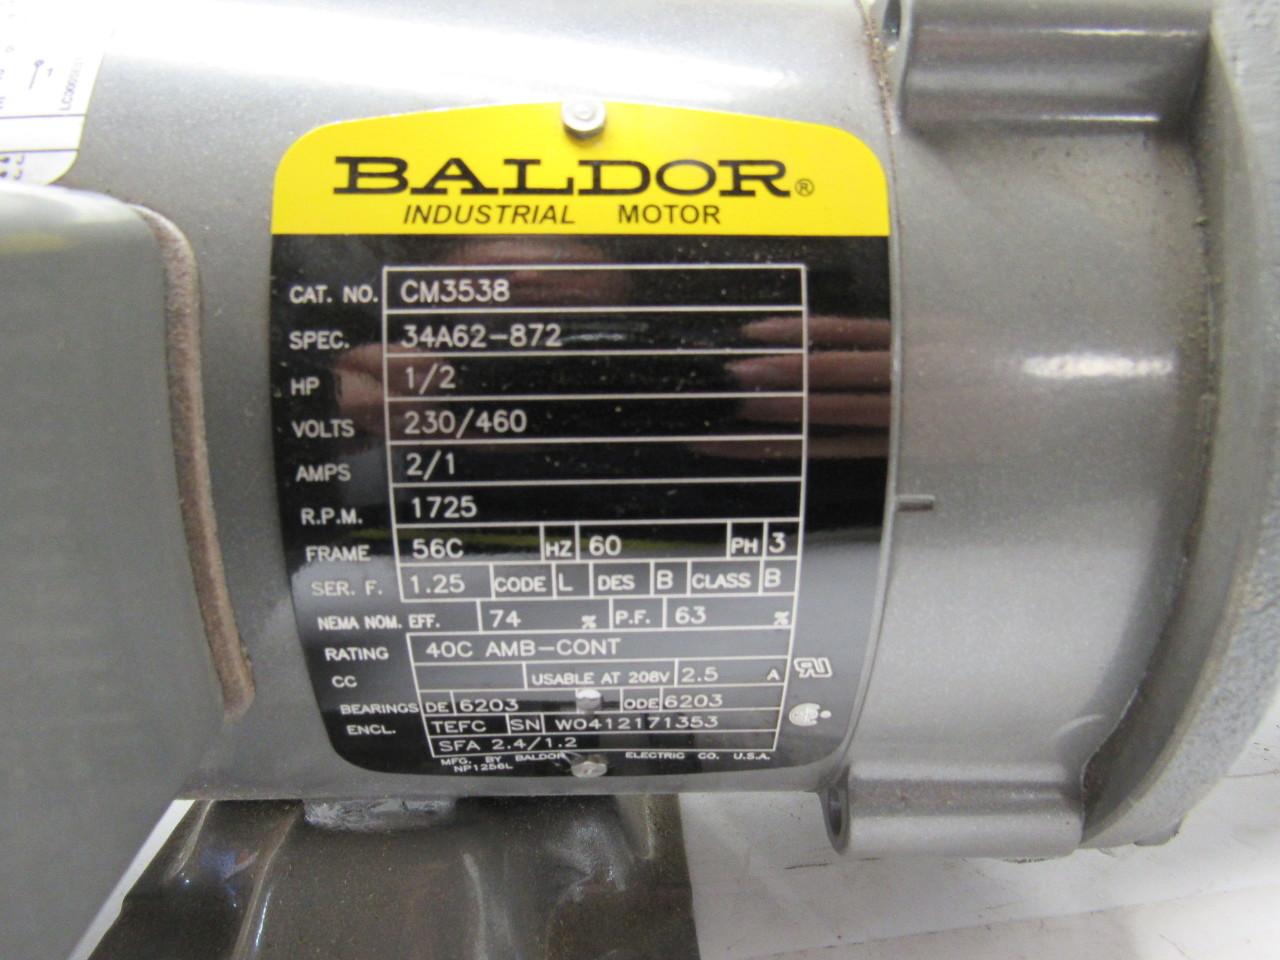 Baldor viking vm3538 7r948c1 hydraulic pump 1 2 hp for 1 2 horsepower electric motor